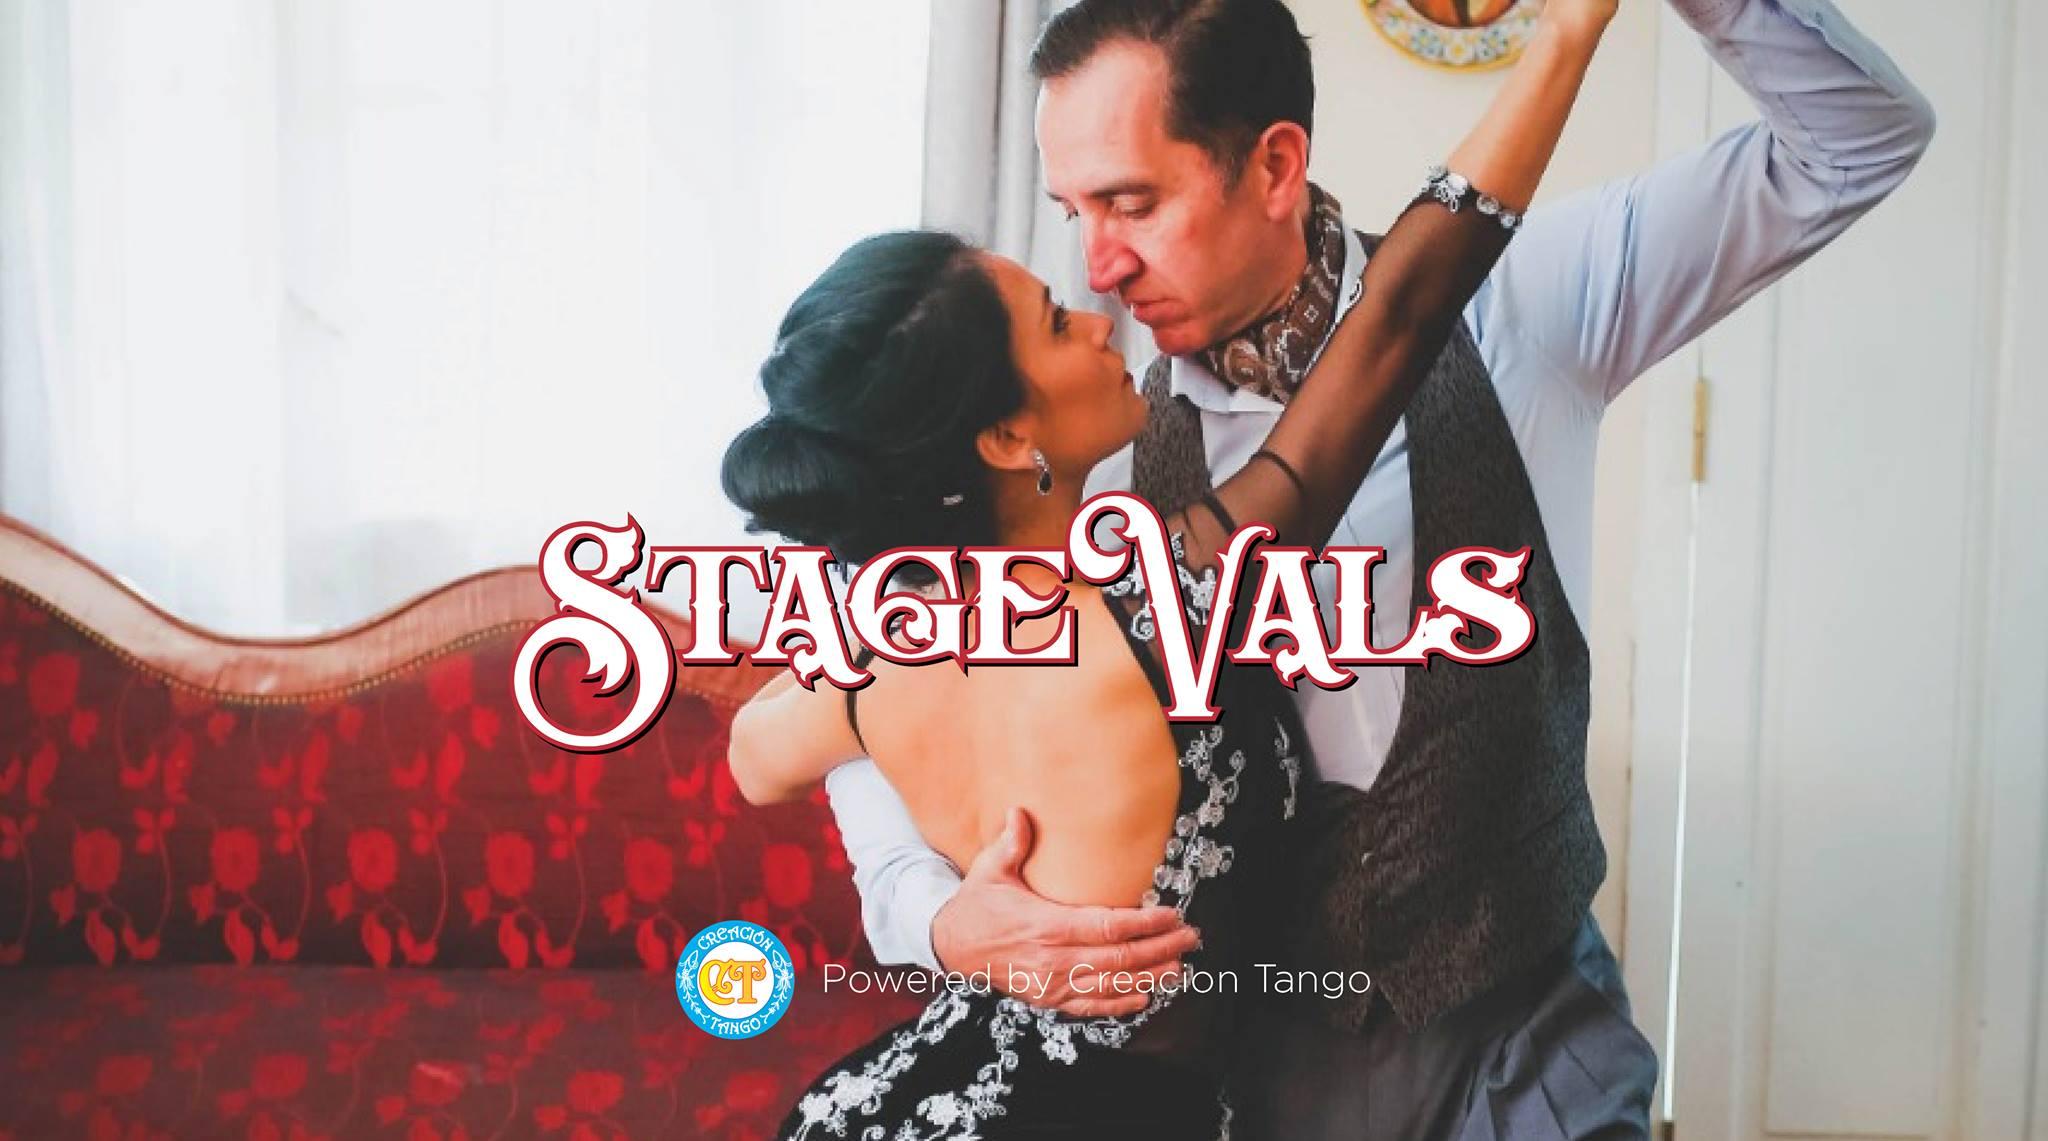 Sage Vals Domenica 18 Novembre